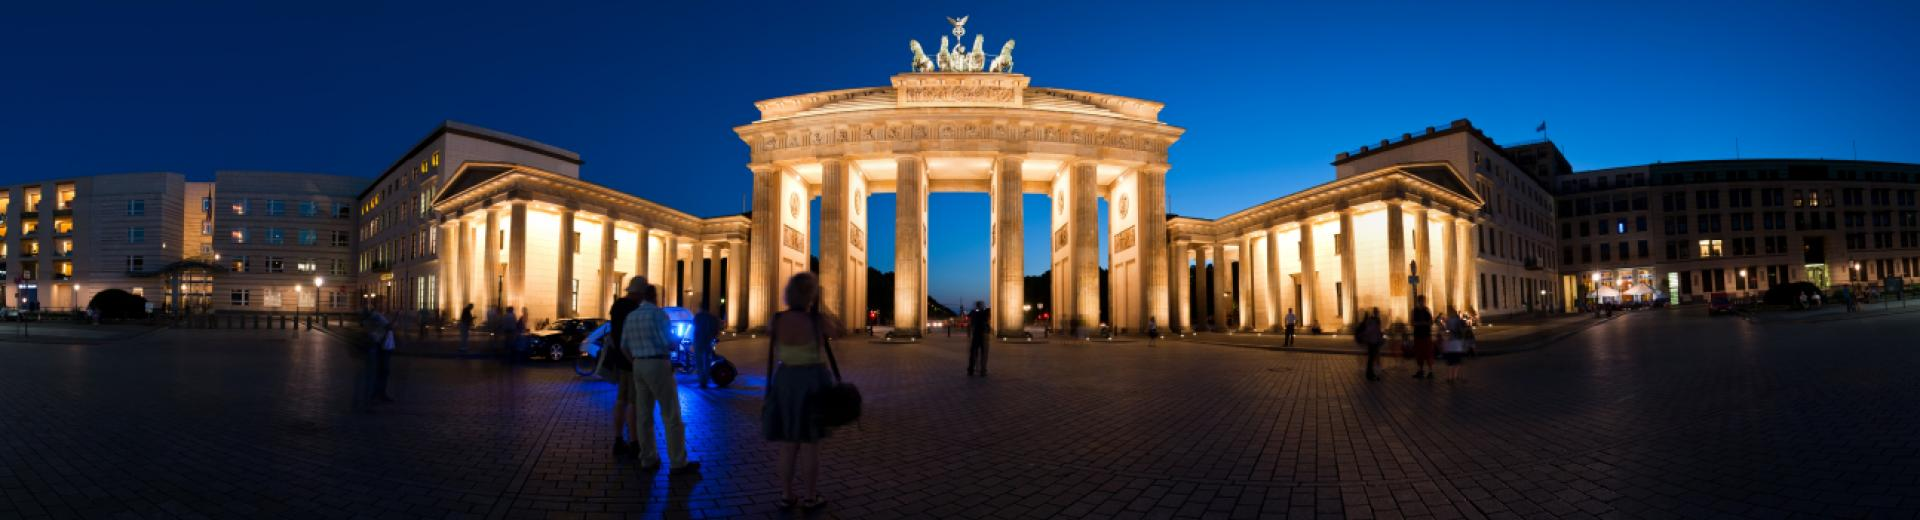 Berlin BrandenburgGate